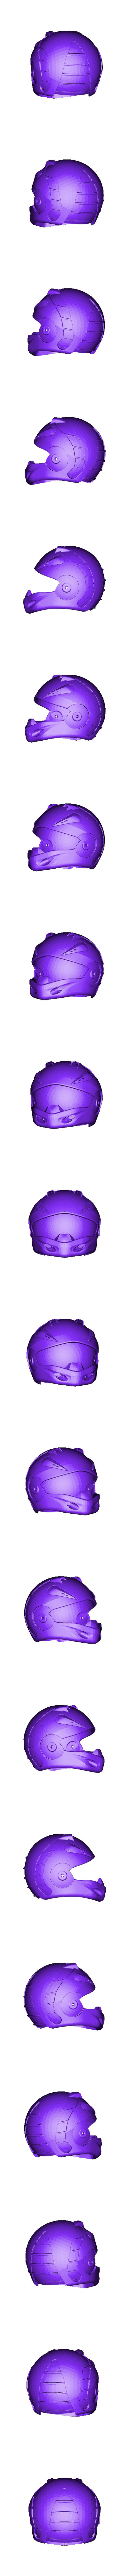 helmet1.stl Download free STL file helmet model with contest • 3D printer object, AlbertKhan3D